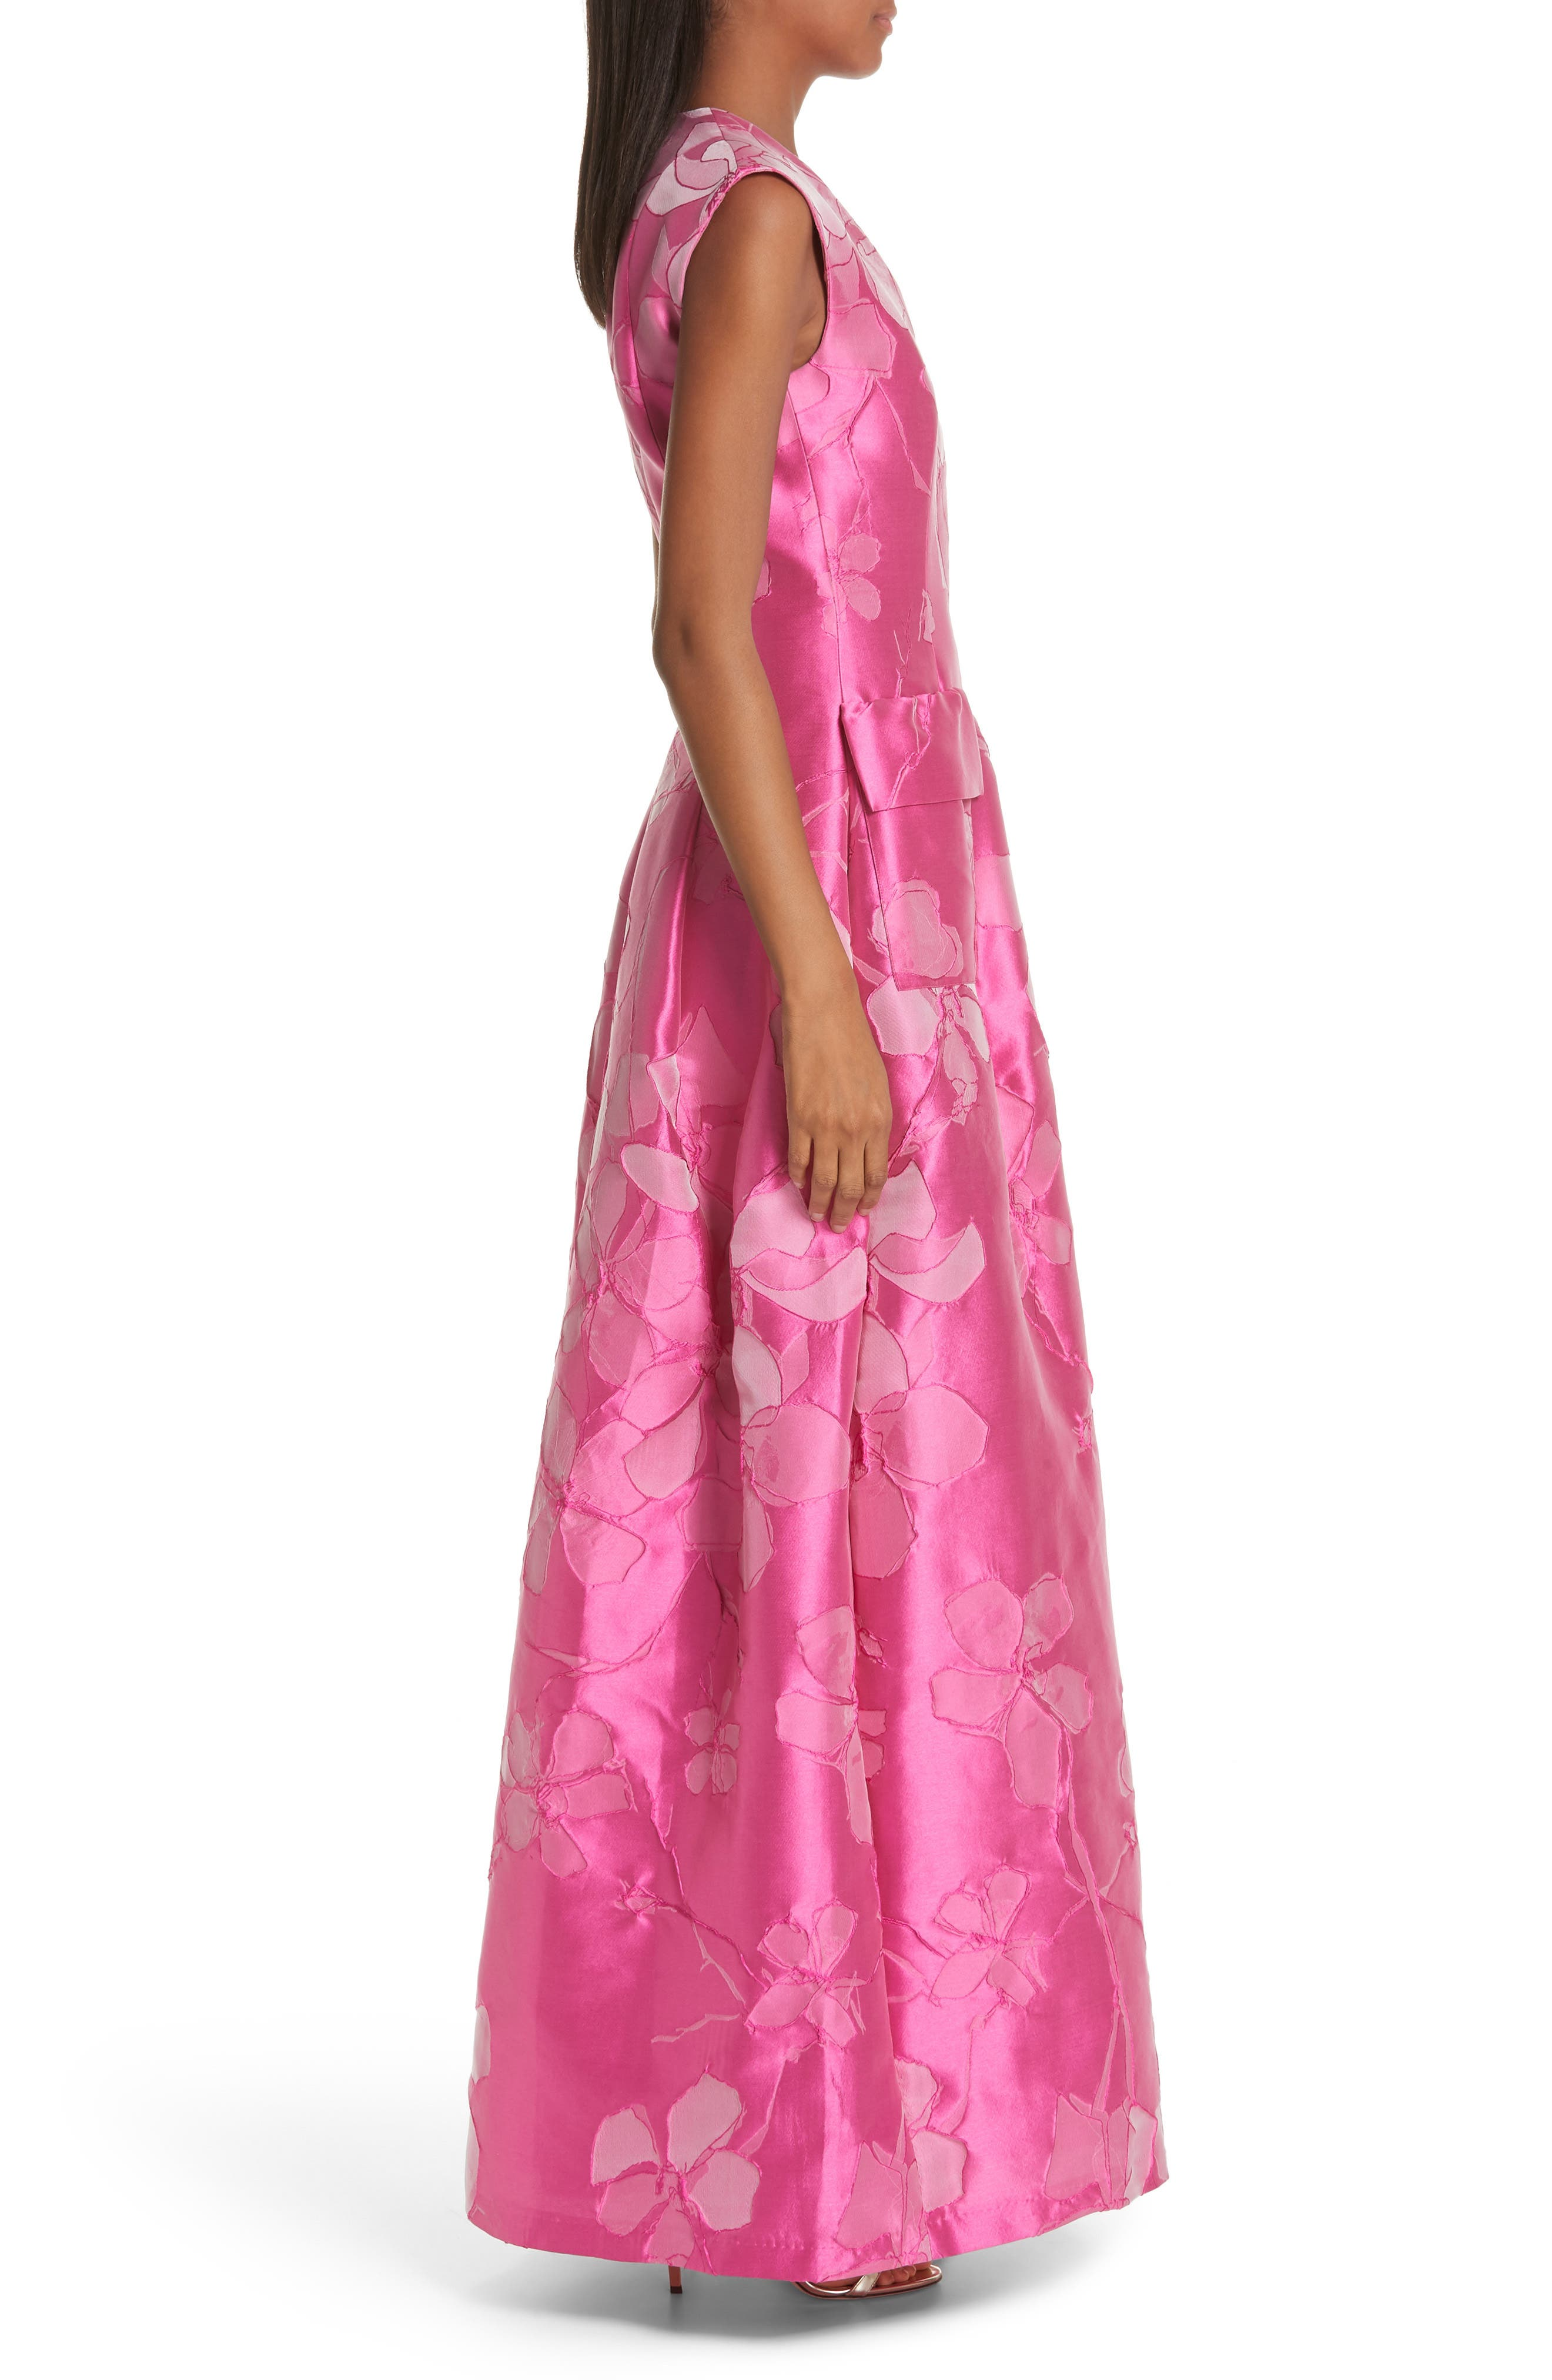 TALBOT RUNHOF,                             Floral V-Neck Evening Dress,                             Alternate thumbnail 3, color,                             FUCHSIA PINK